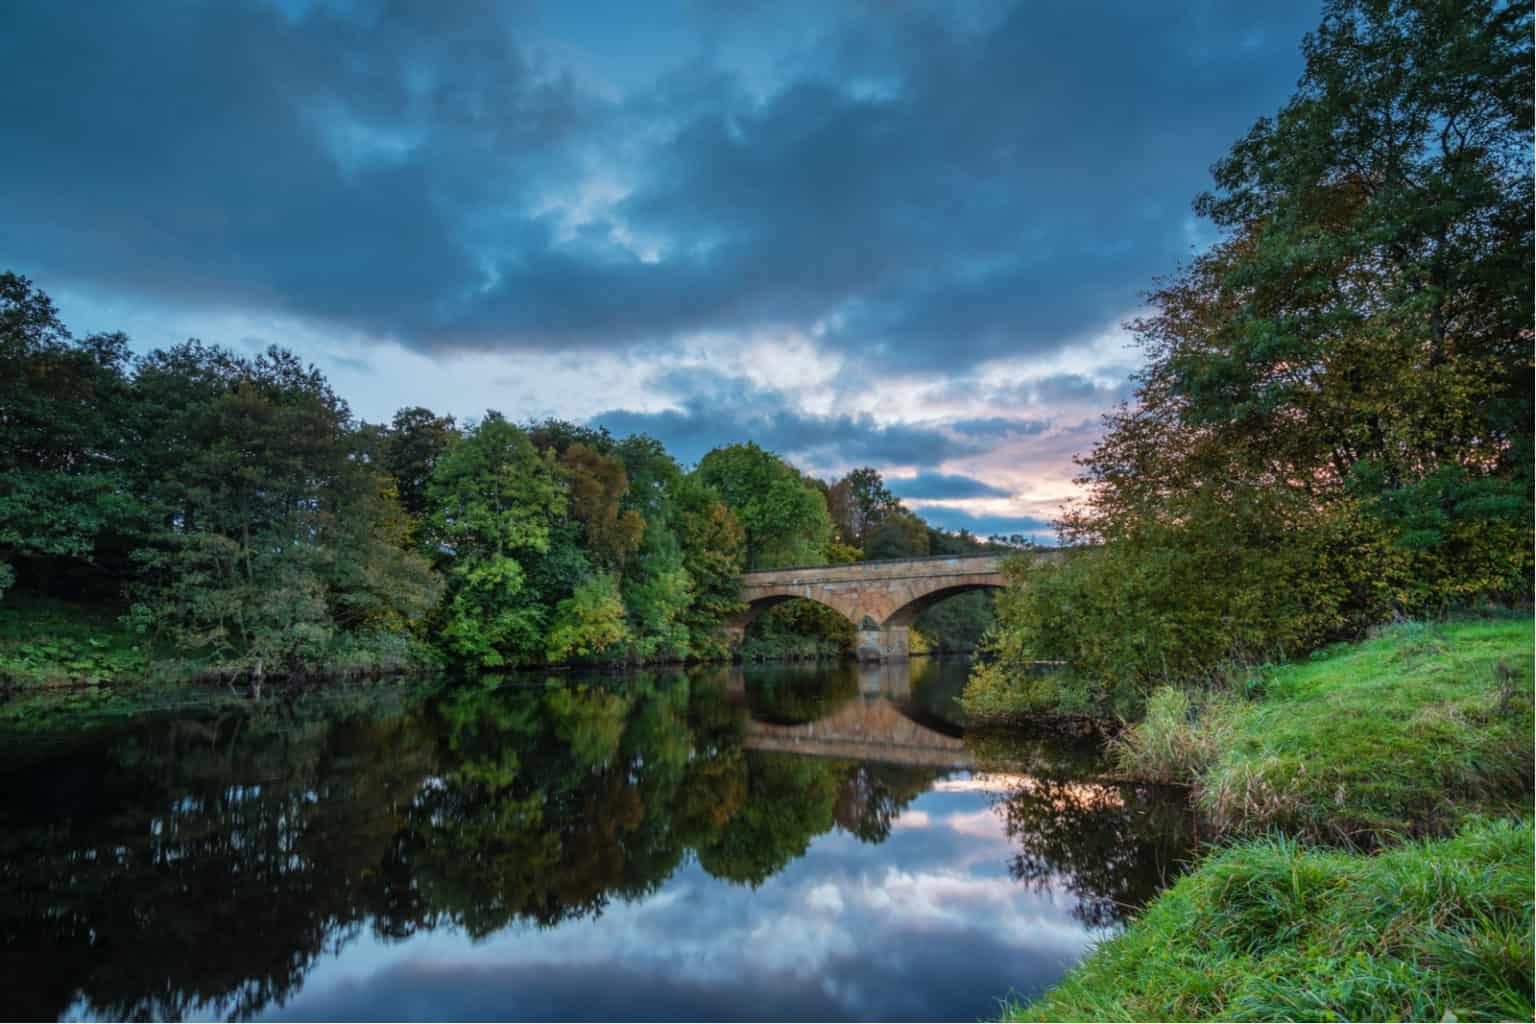 River North Tyne under Bellingham Bridge